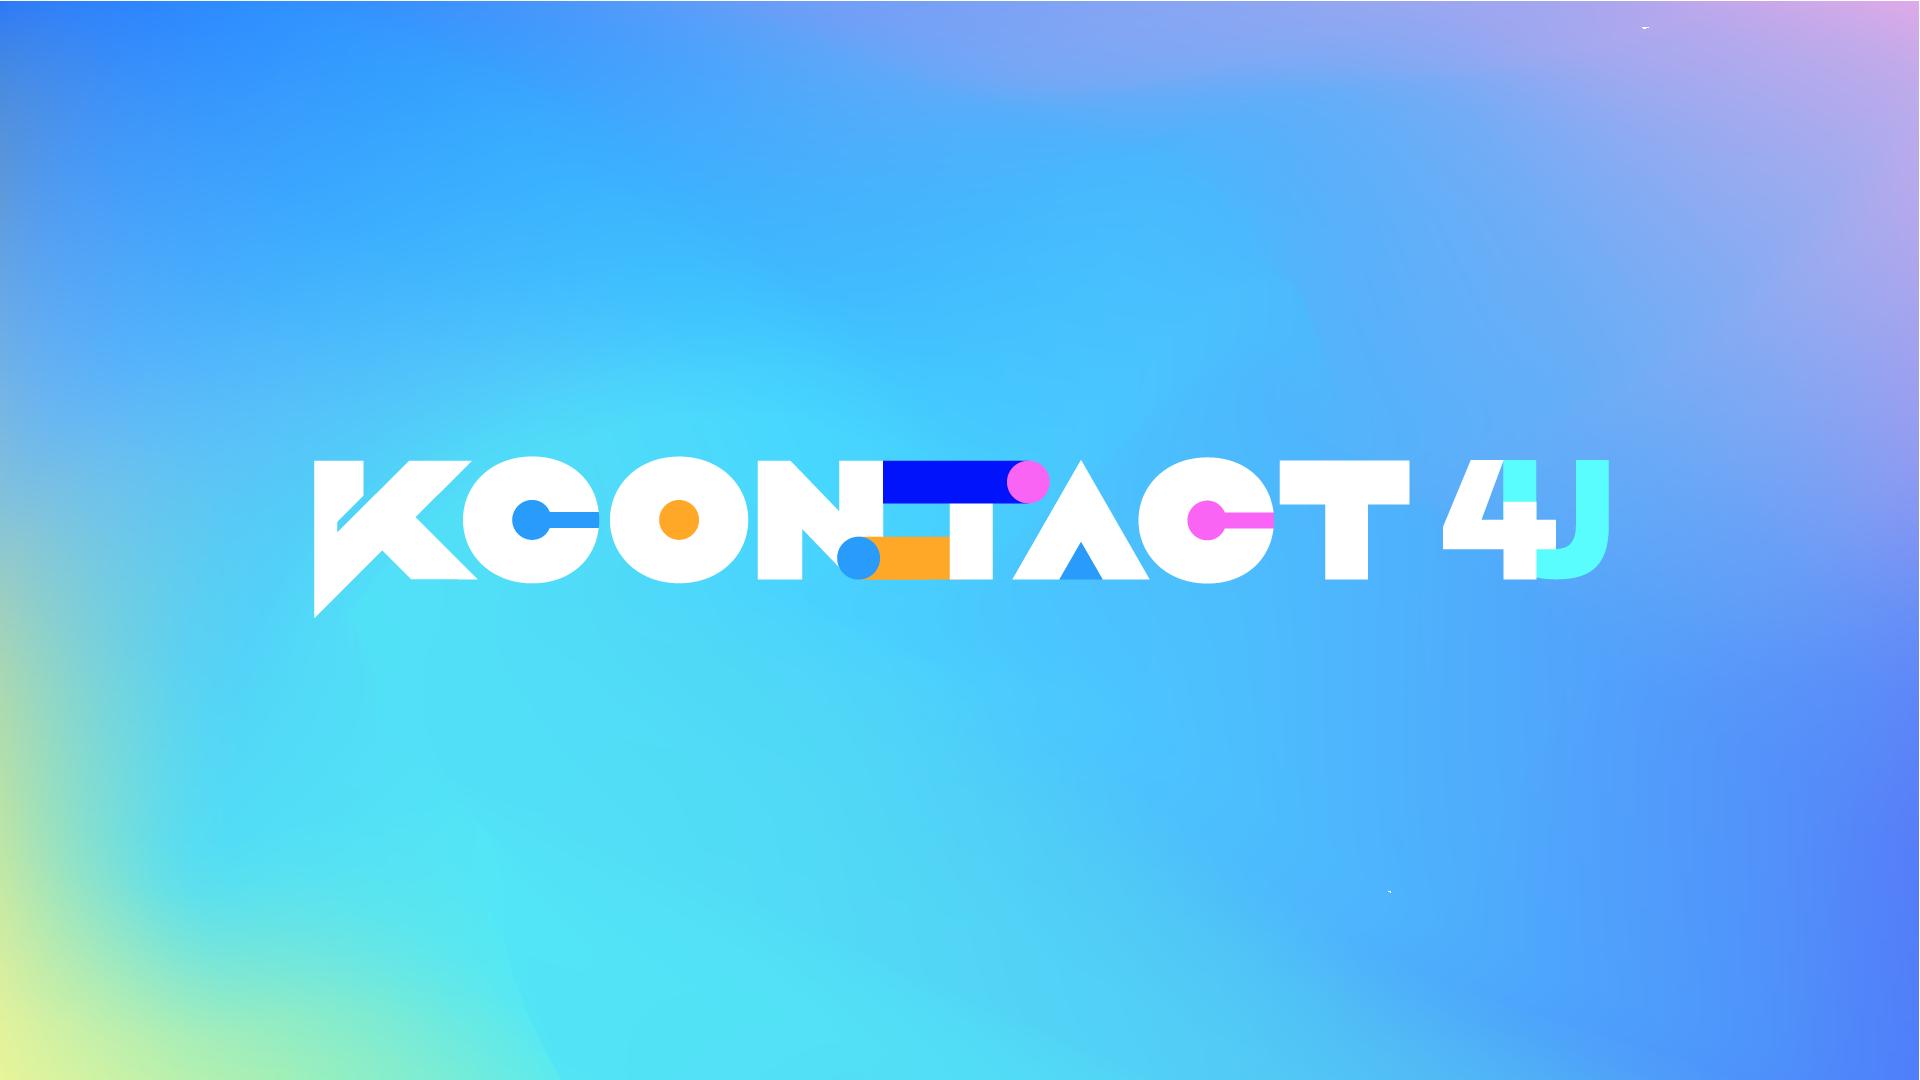 『 KCON:TACT 4U 』  6月19日(土)~27日(日)  KCON OfficialおよびMnet K-POPの YouTubeチャンネルにて開催決定!